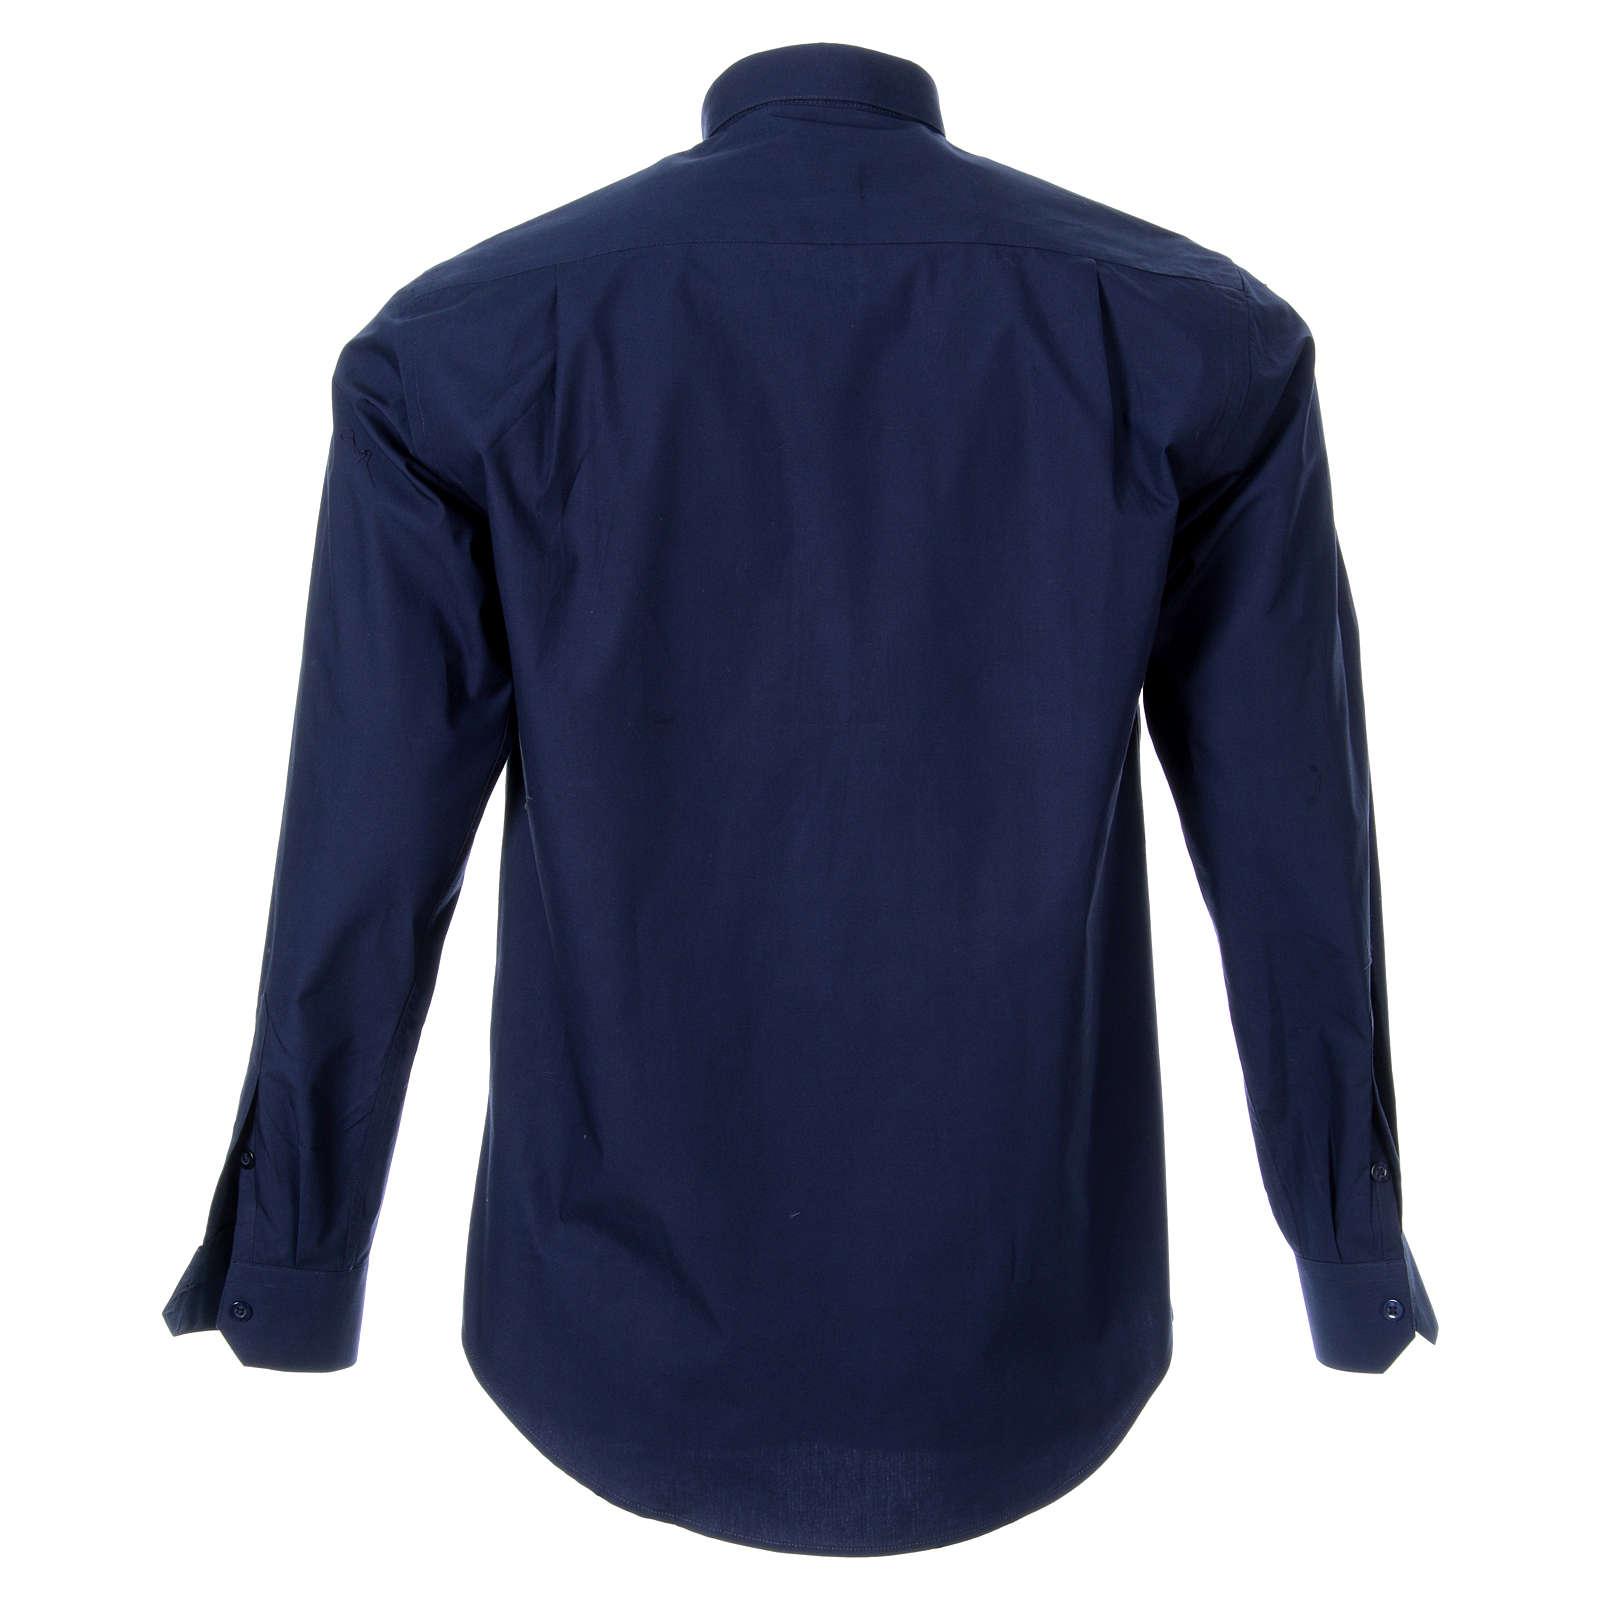 STOCK Camisa clergyman m/l popeline azul escuro 4